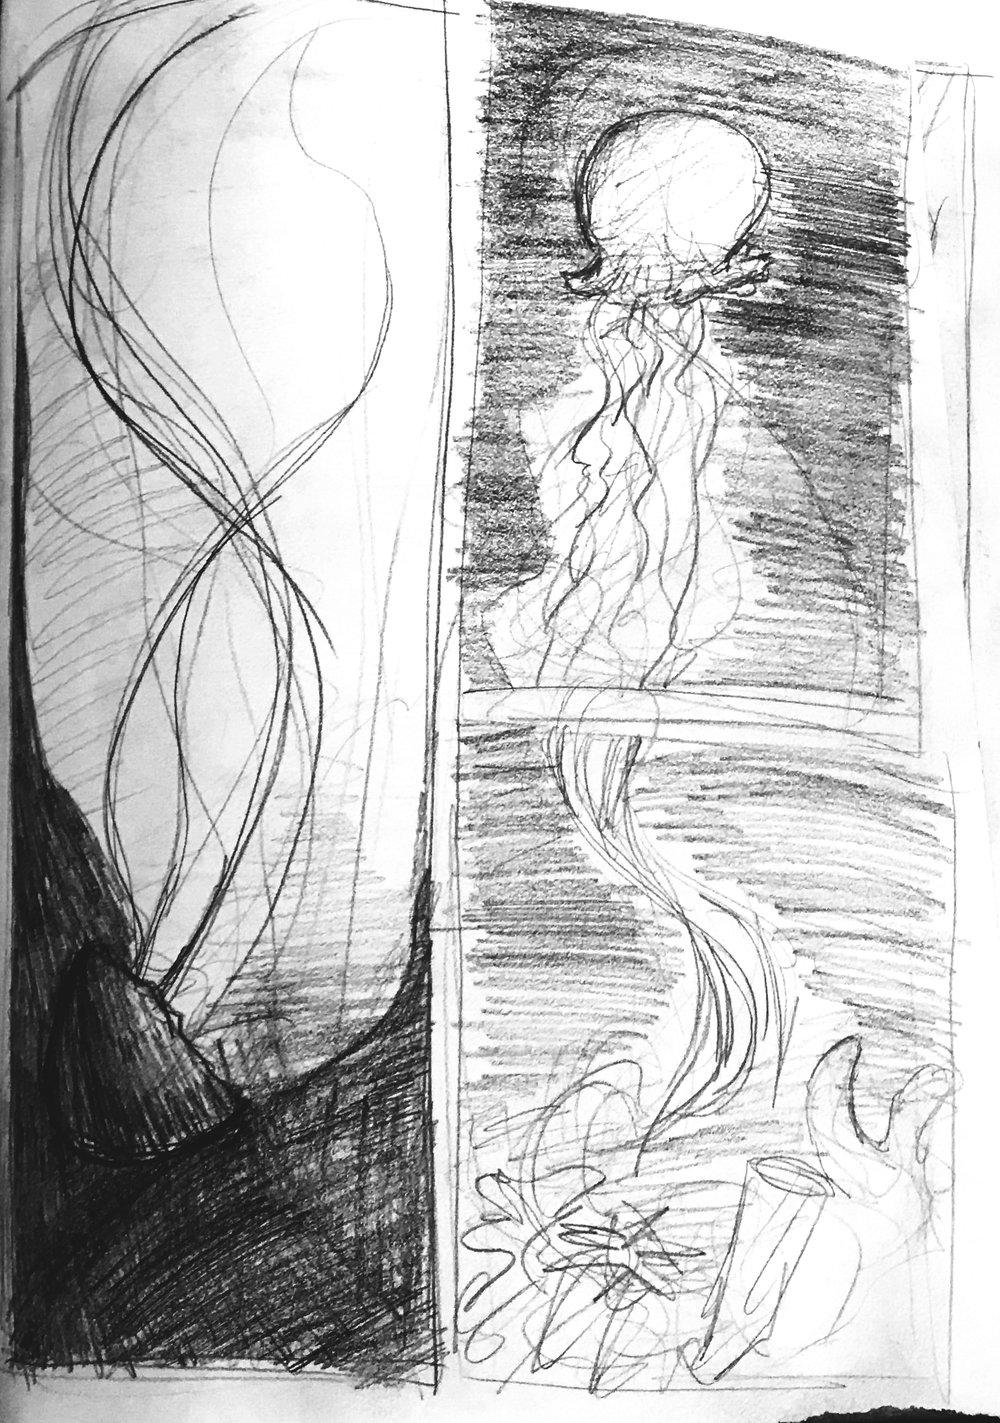 Sketch-Seascape-8.jpg